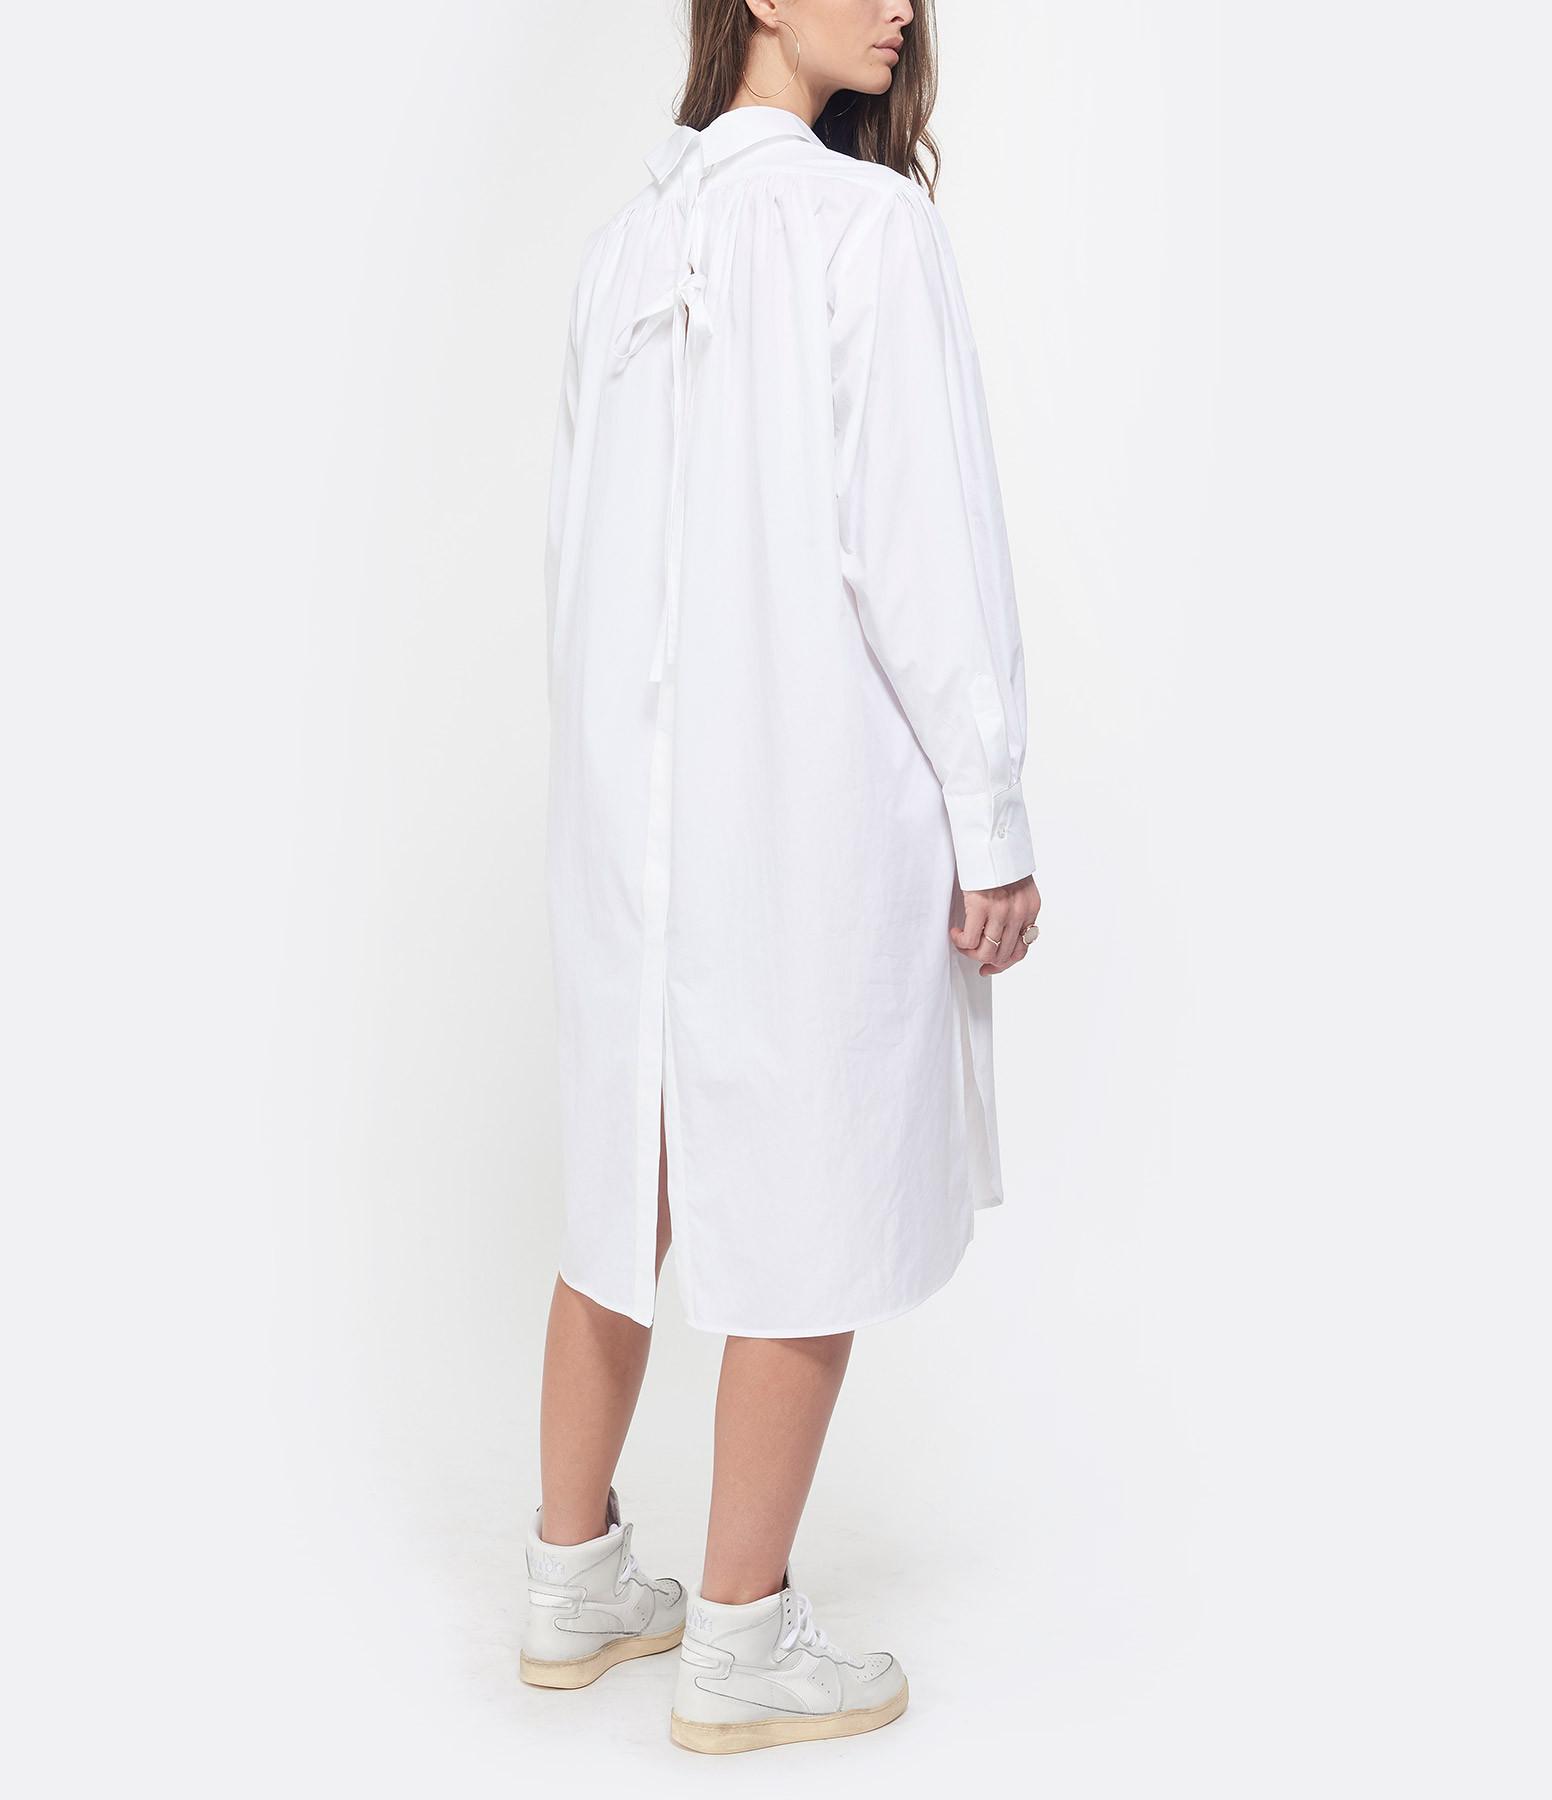 MSGM - Robe Chemise Coton Blanc